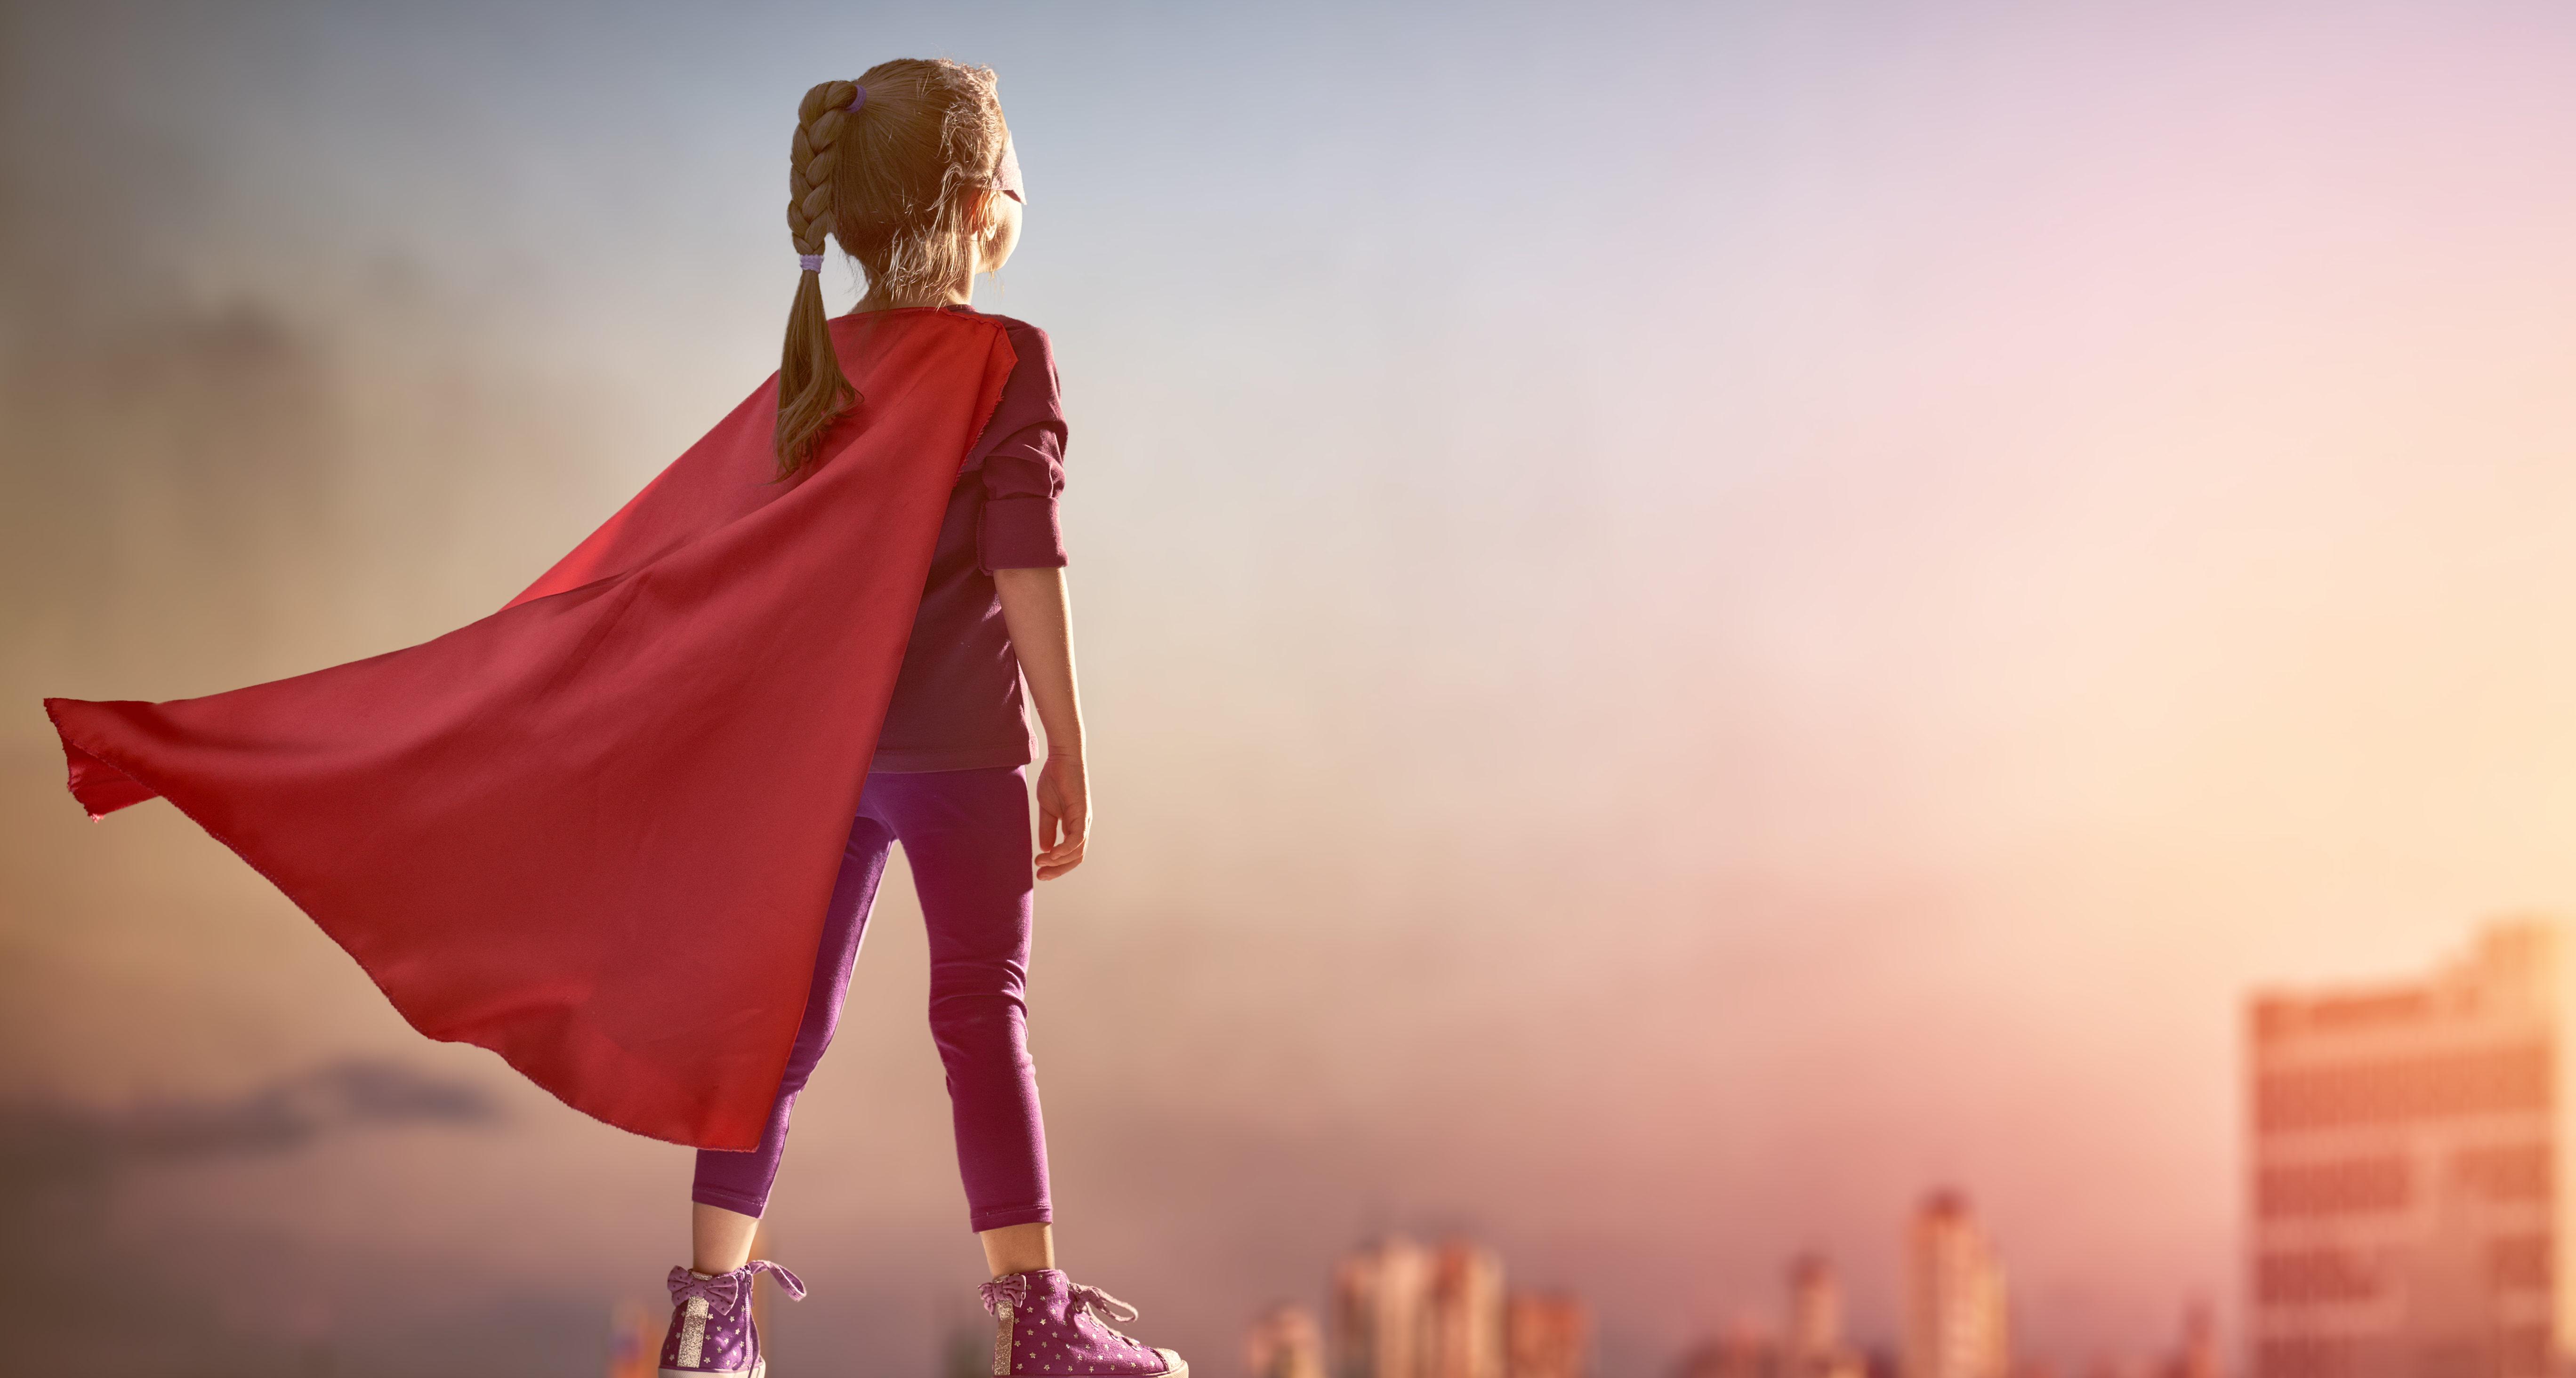 A little girl plays a superhero. (Photo: Shutterstock/Yuganov Konstantin)